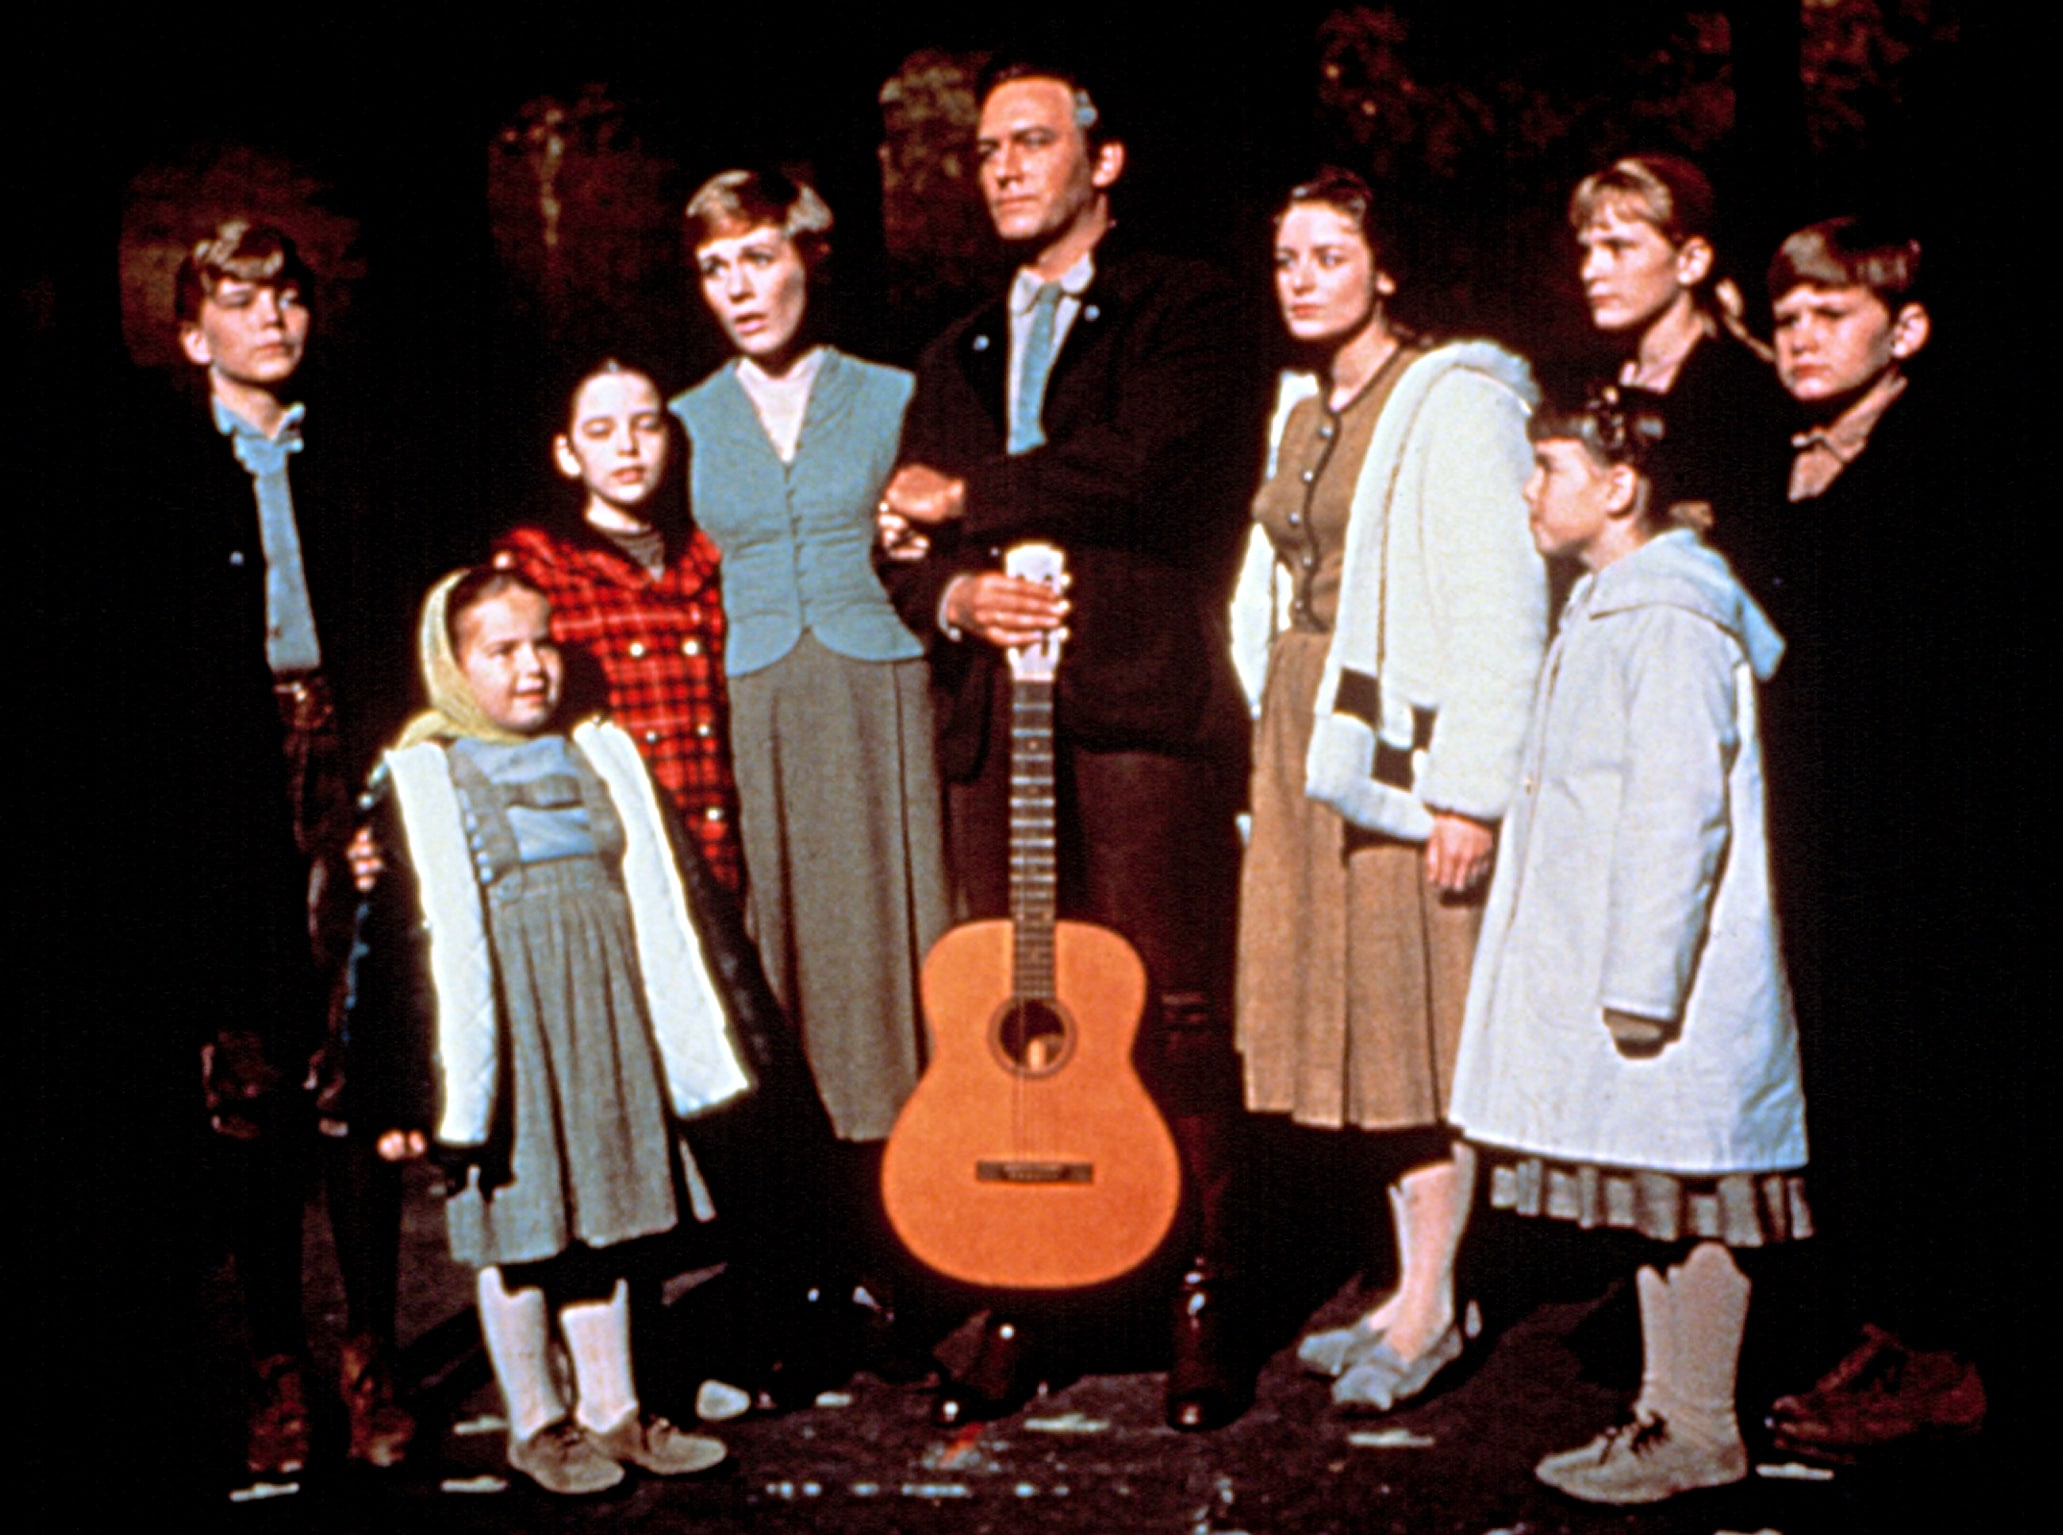 THE SOUND OF MUSIC, Julie Andrews, Christopher Plummer, 1965